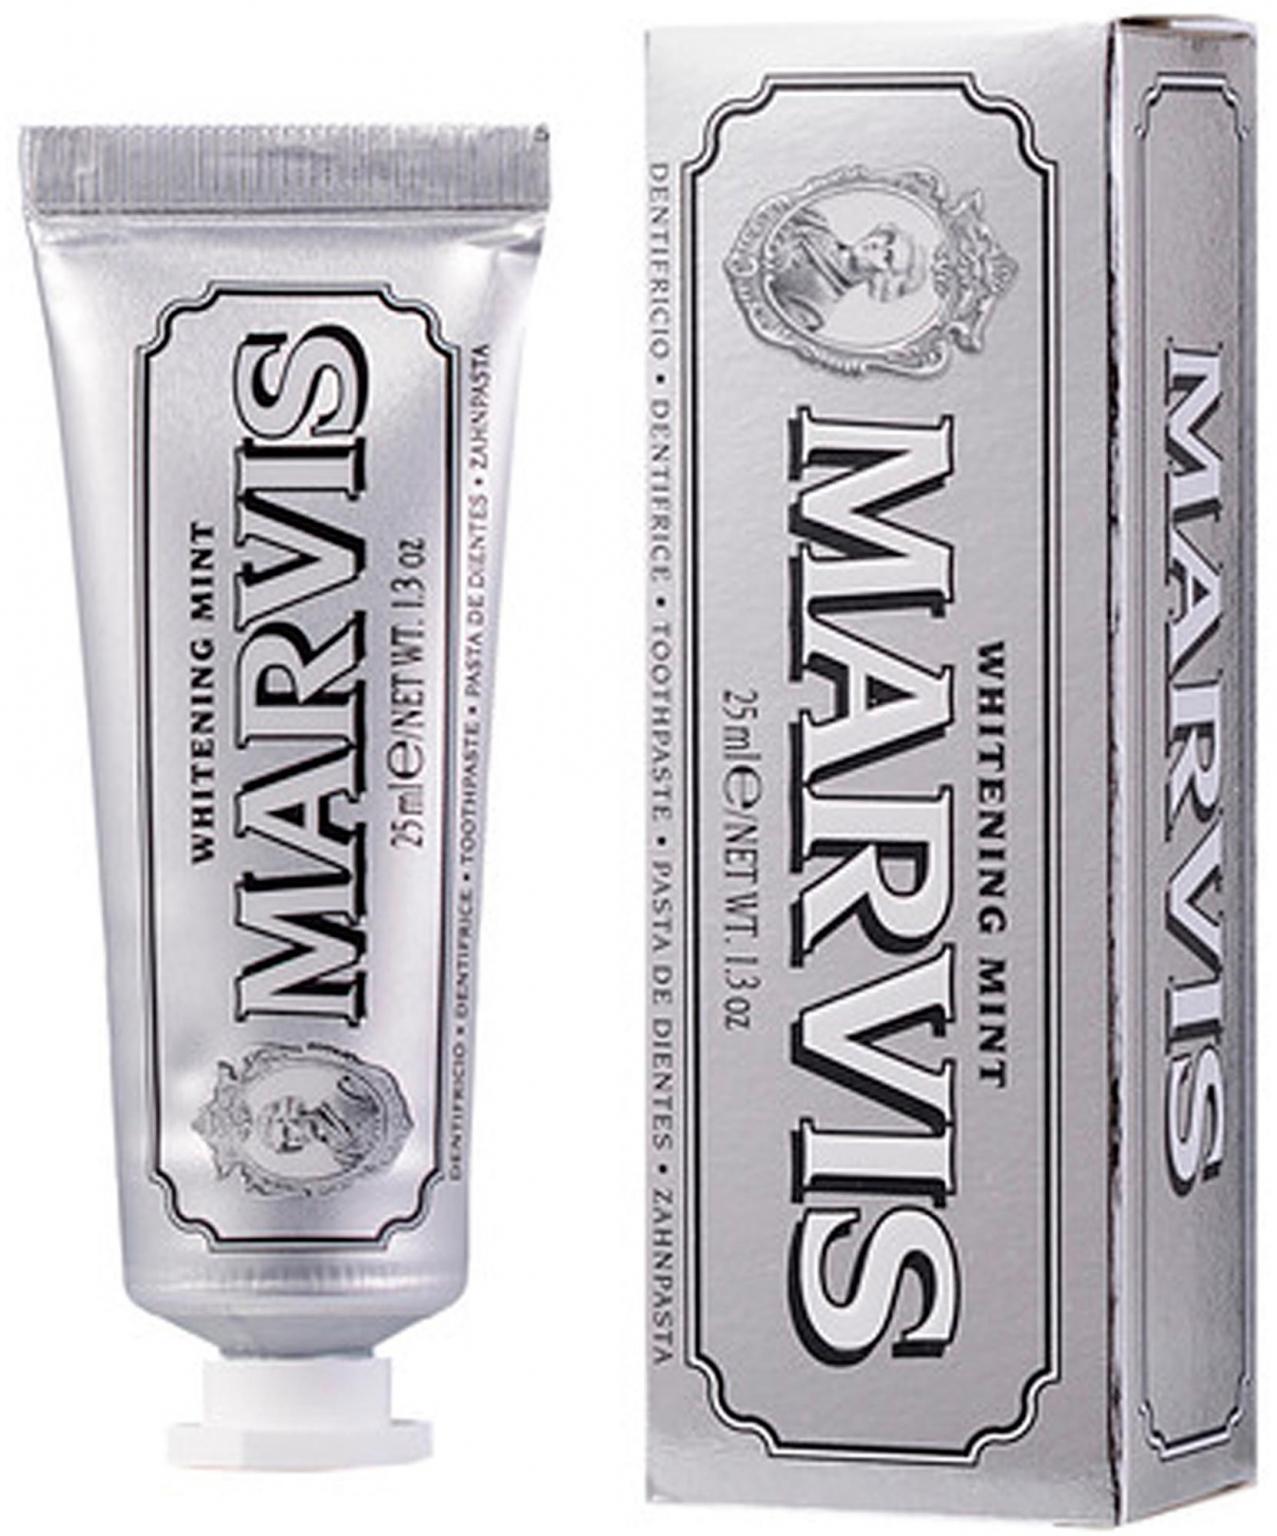 Зубная паста Marvis Whitening Mint Отбеливающая 25 мл